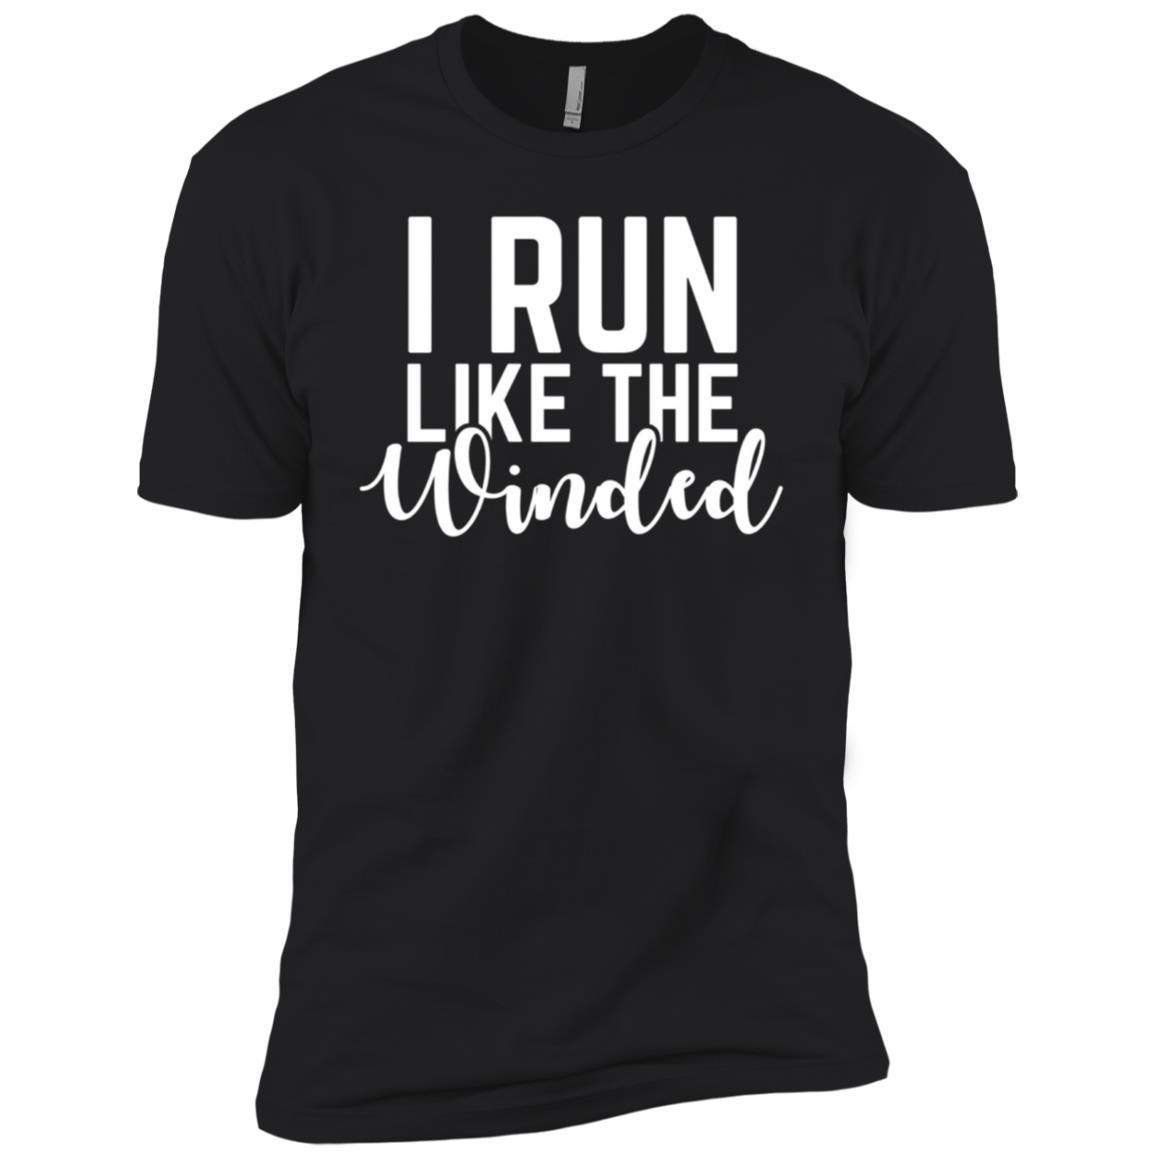 I Run Like The Winded Funny Running Men Short Sleeve T-Shirt